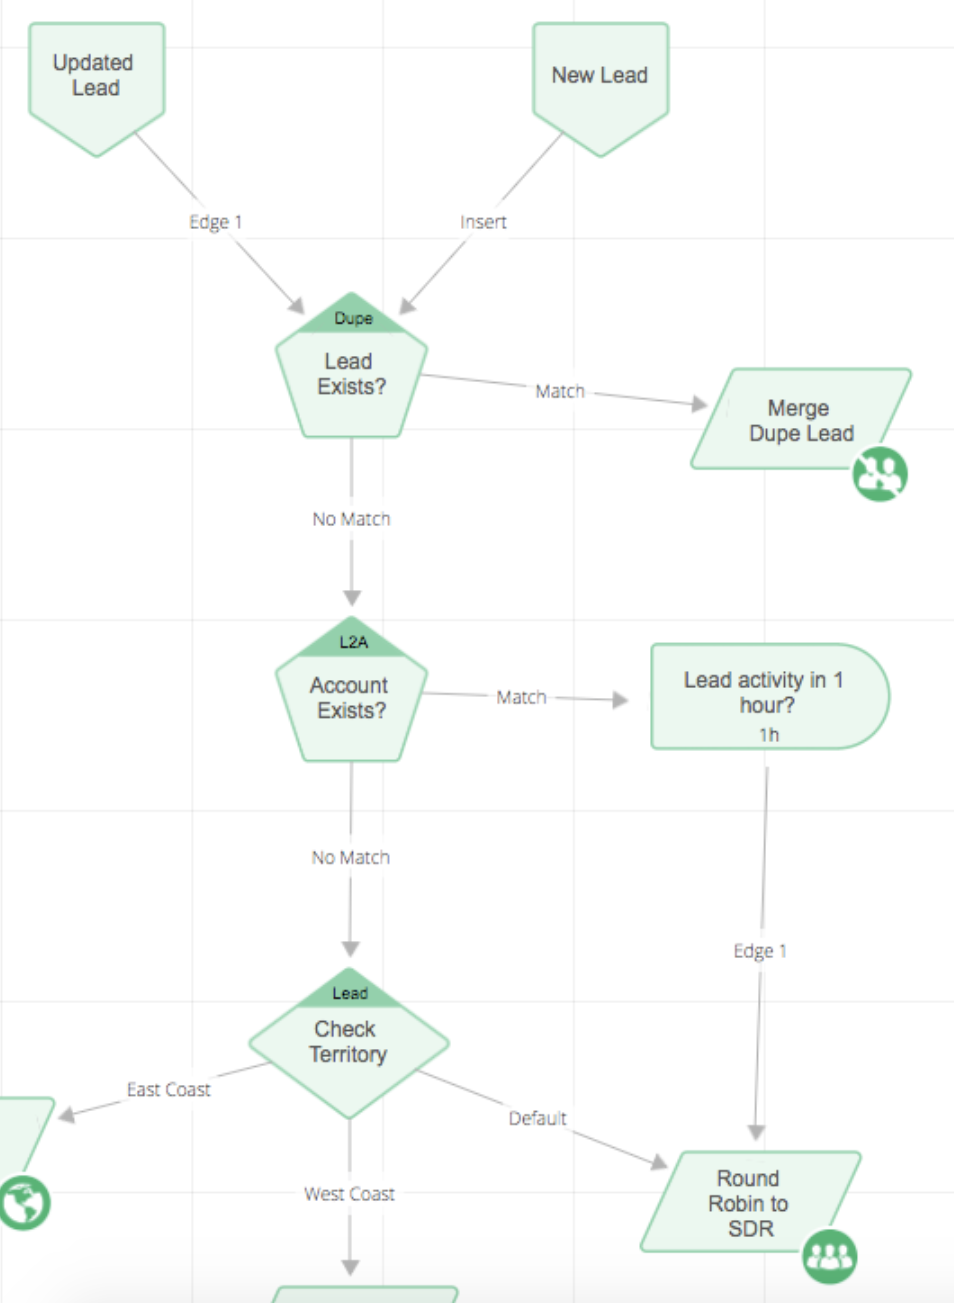 flowbuilder-for-lead-routing